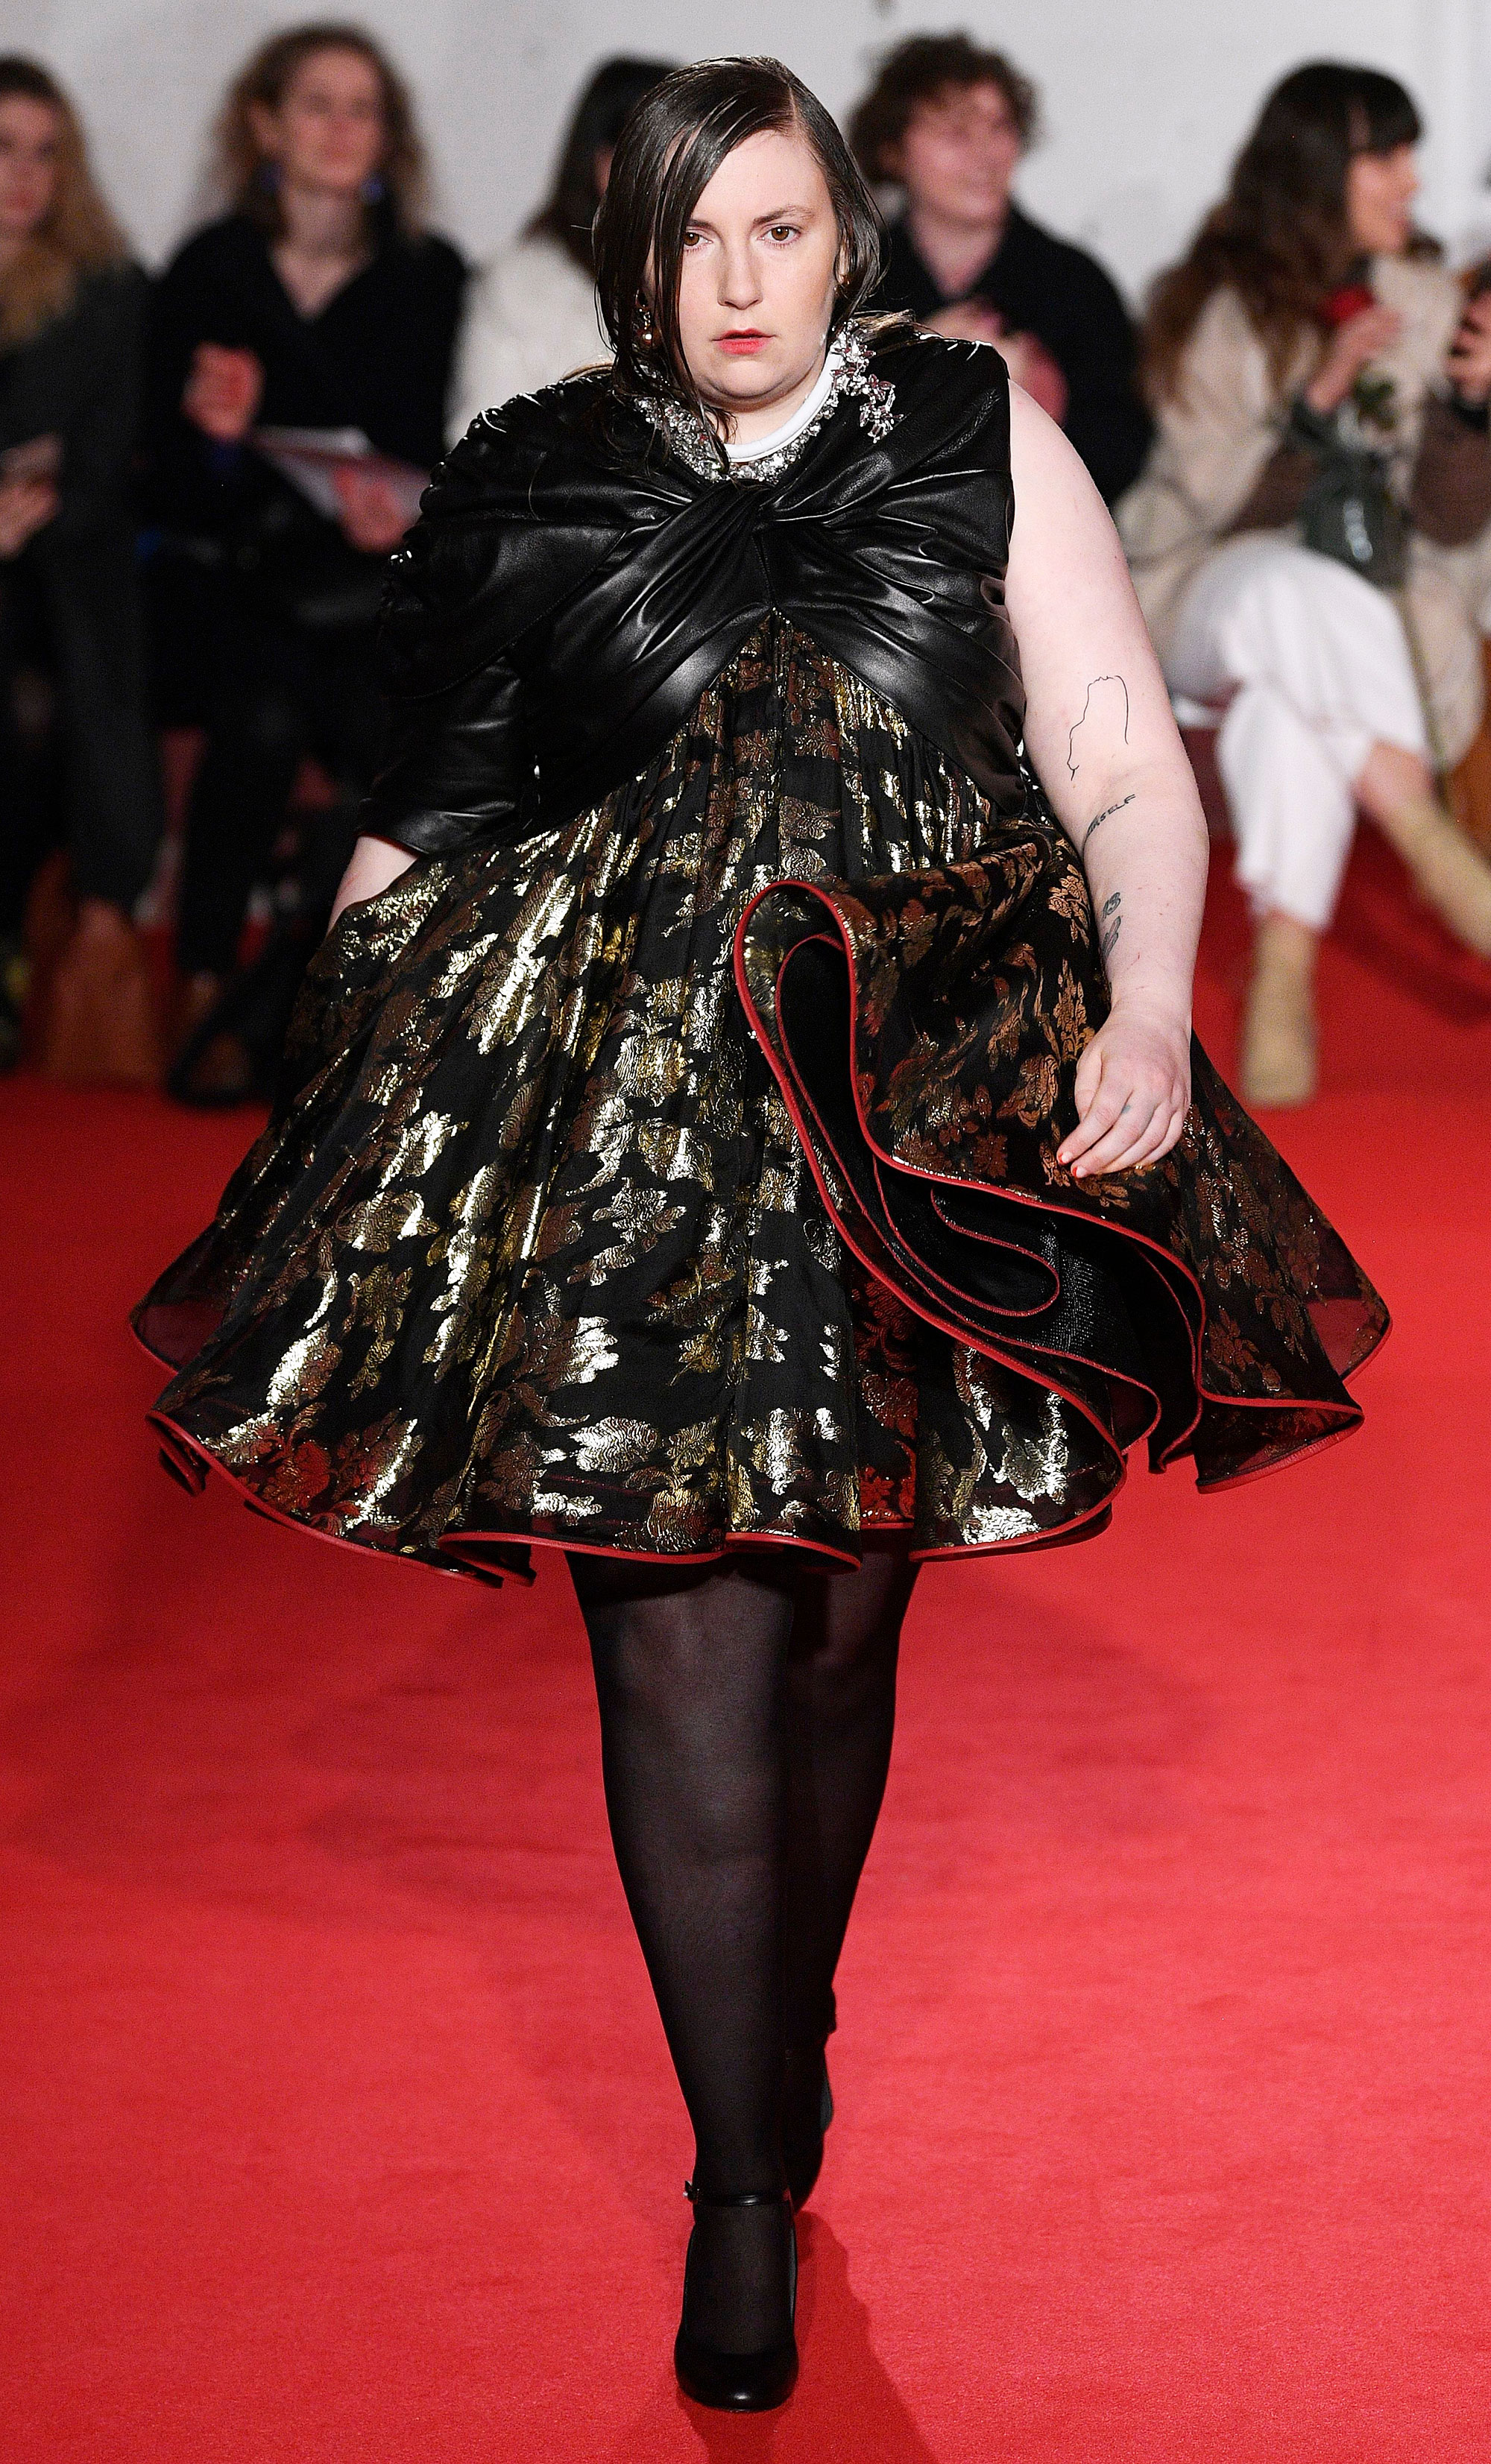 Lena Dunham Makes Runway Debut During London Fashion Week